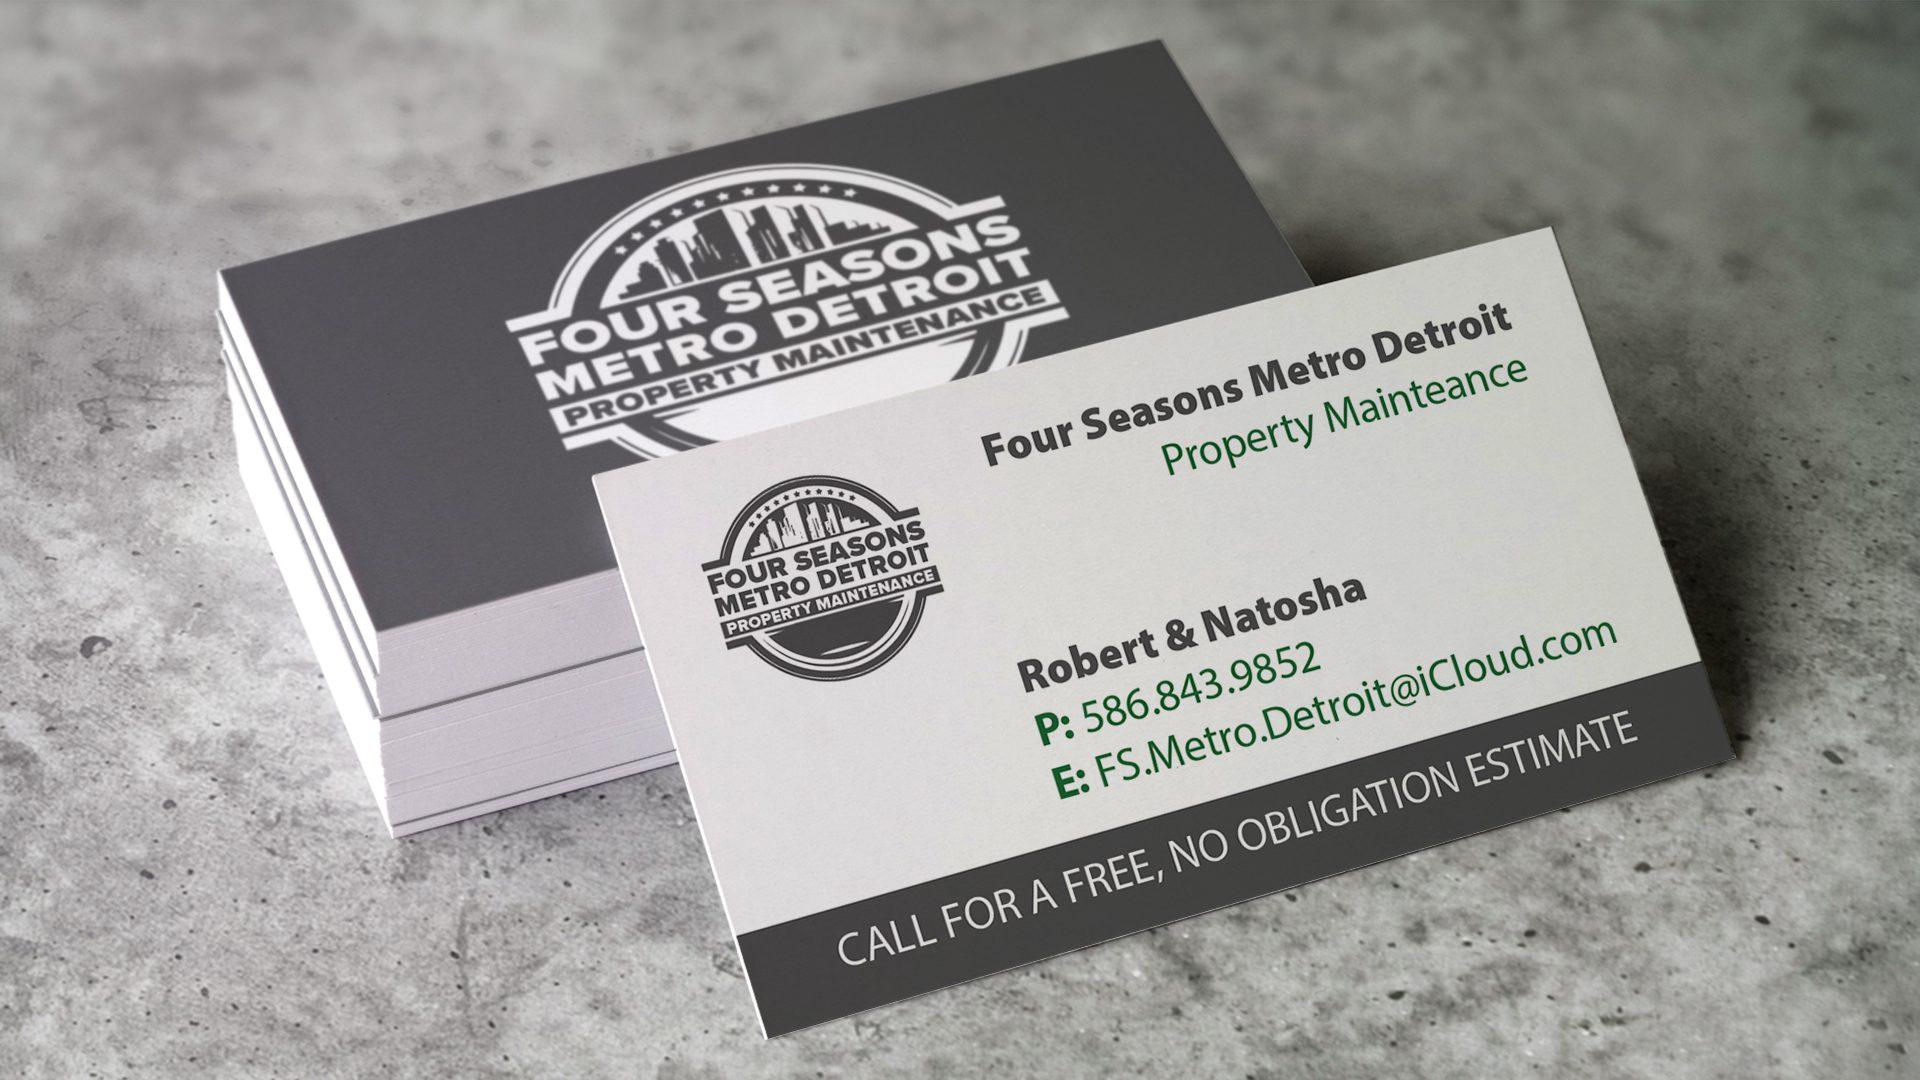 Four Seasons Metro Detroit - Robs Business Card Mockup (1)